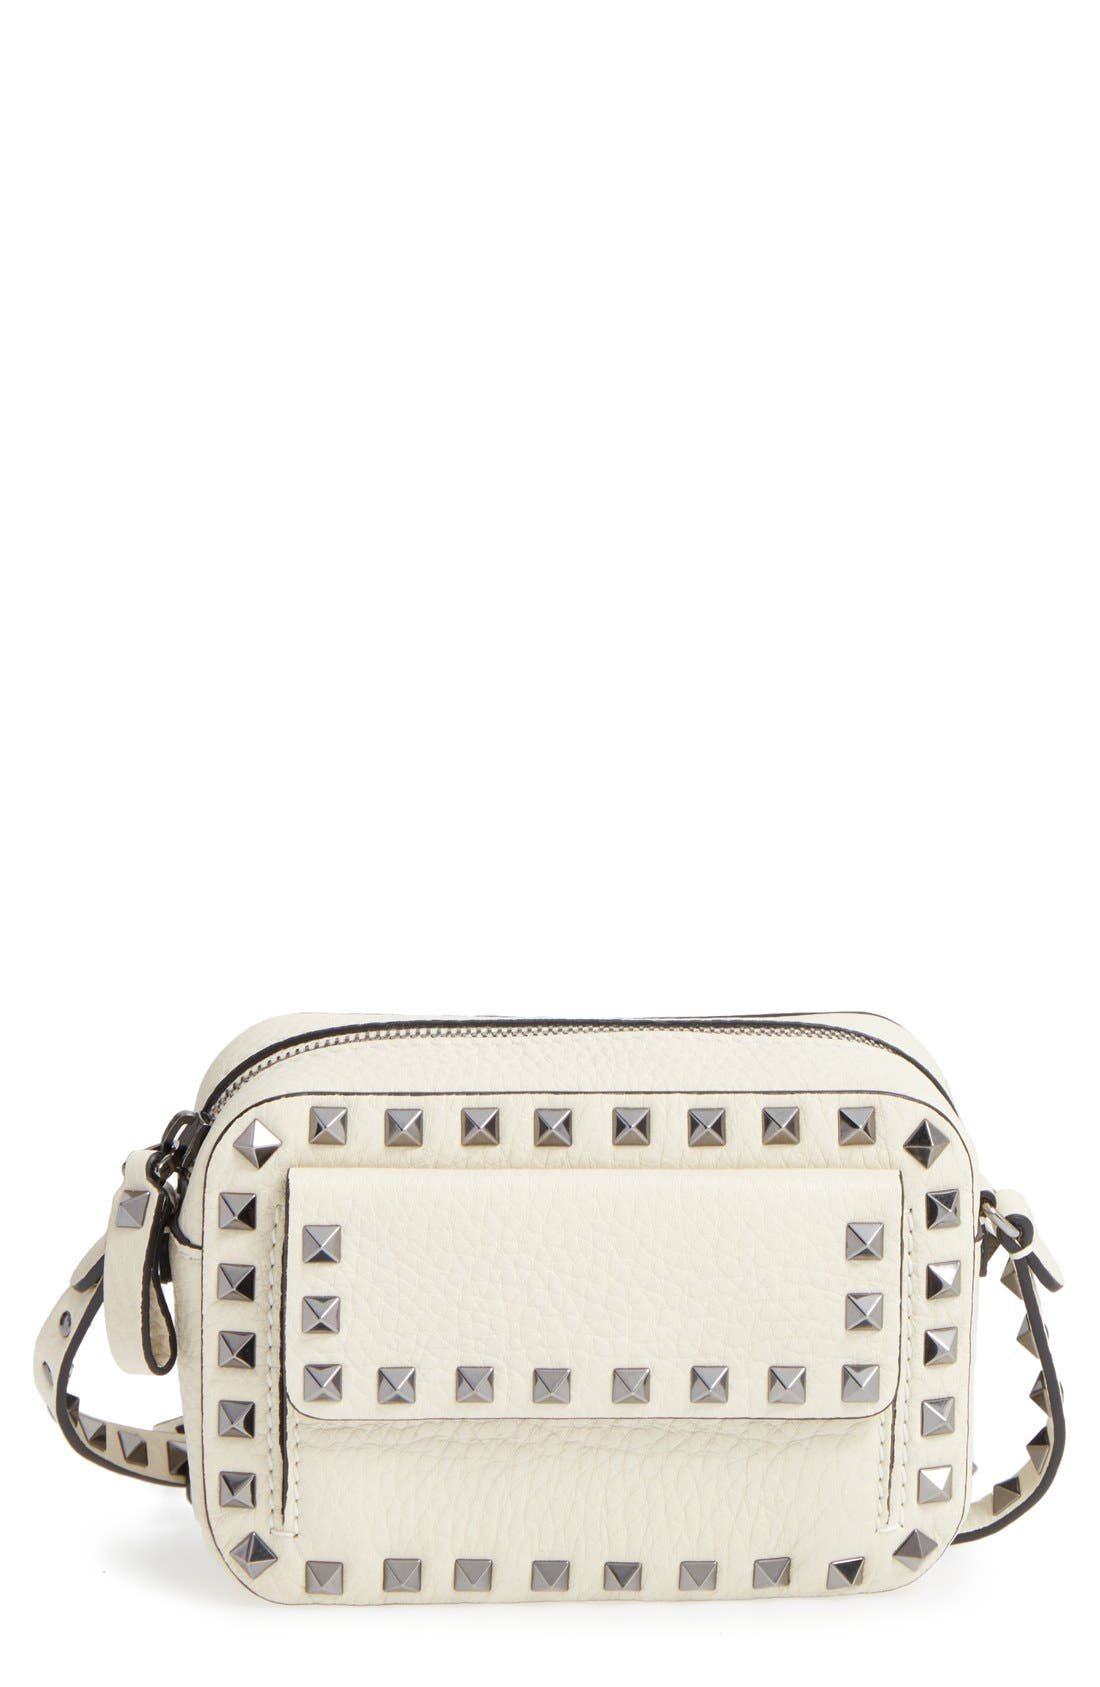 Alternate Image 1 Selected - Valentino Rockstud Mini Camera Crossbody Bag